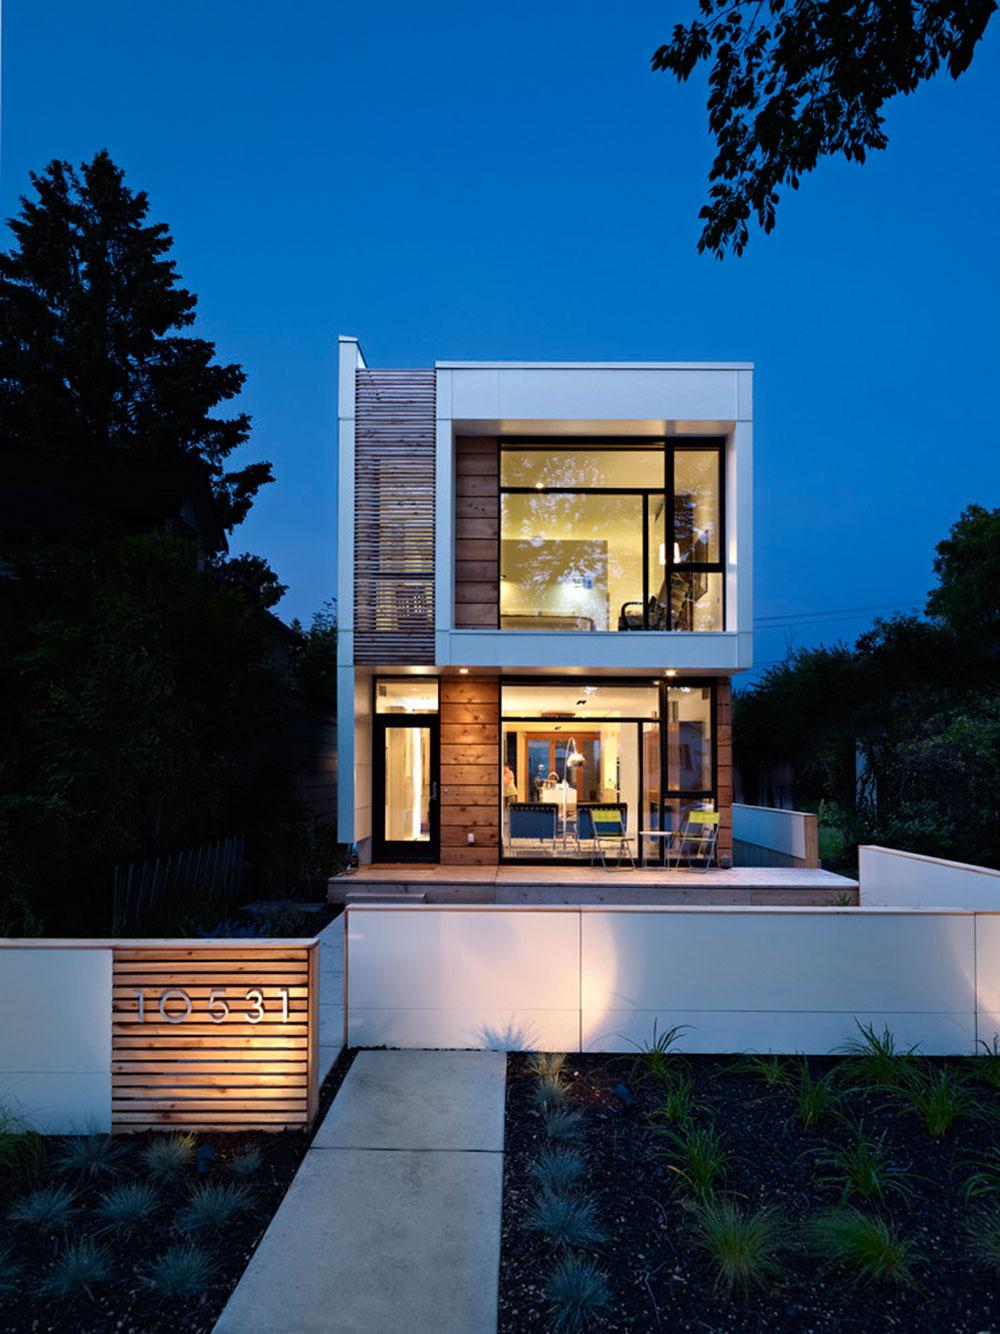 Exterior Design Tips - Everyone Should Follow 1 exterior design tips that everyone should be following